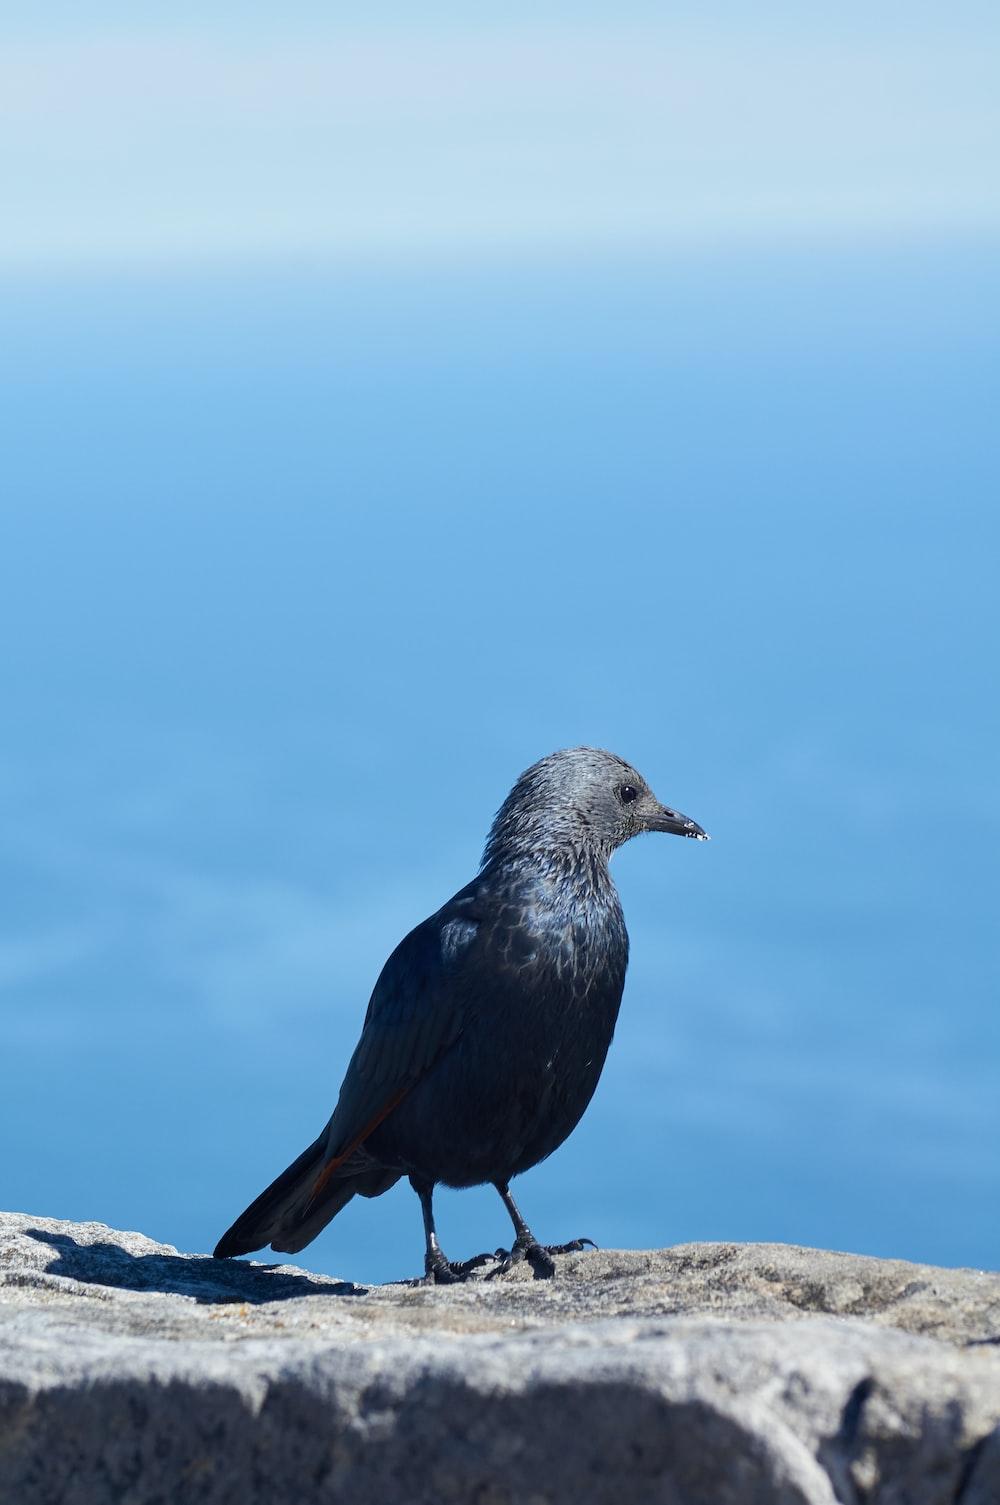 black bird on stone during daytime